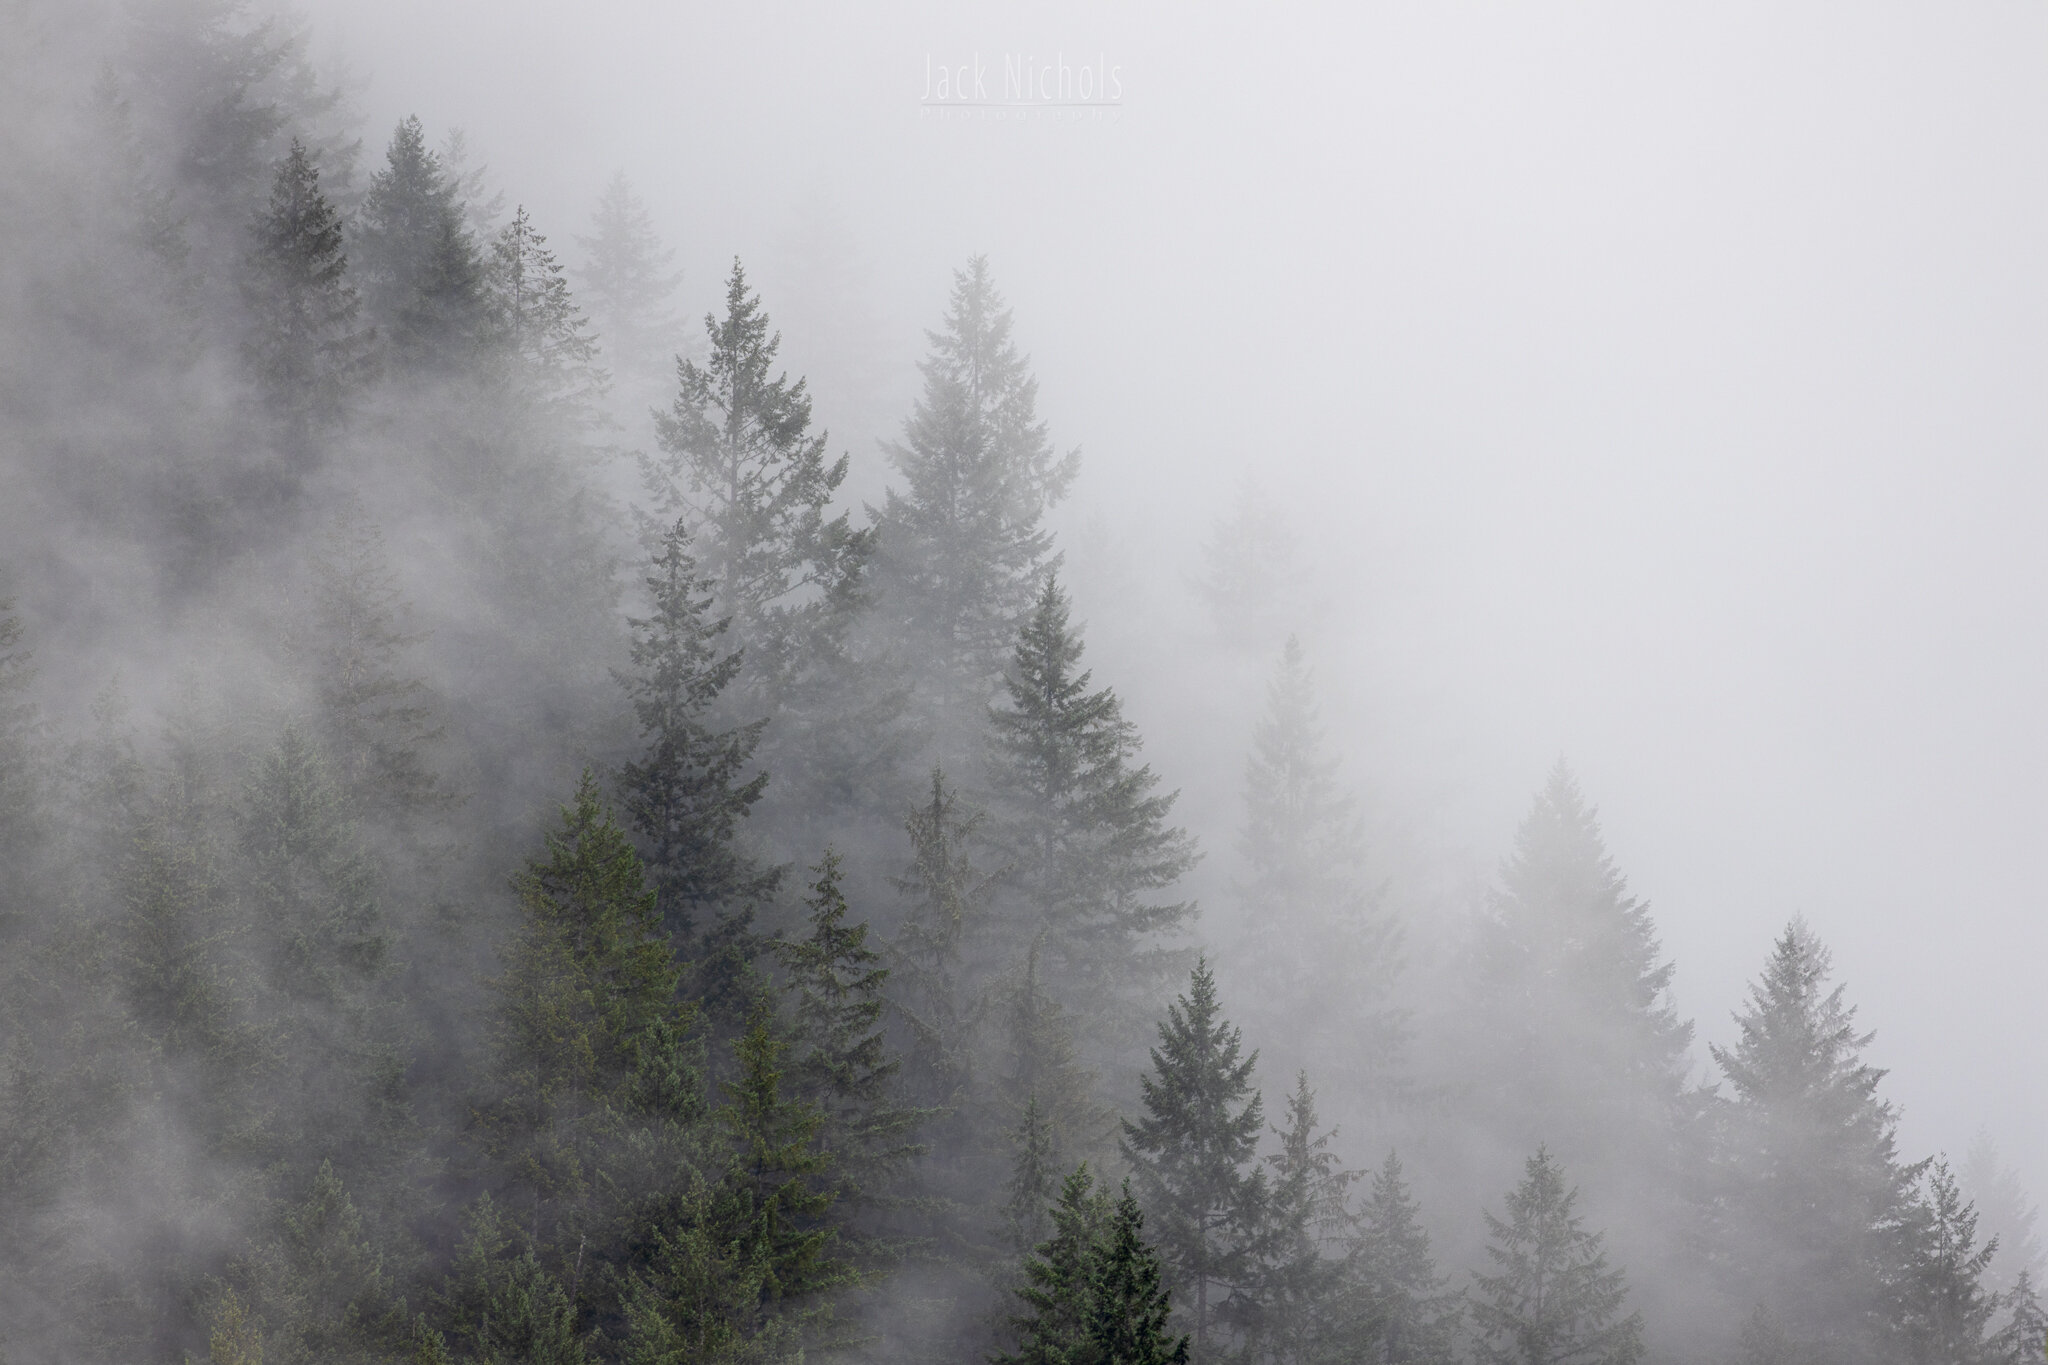 Campbell River, Toba Inlet - Foggy forest ridgeline-20190908.jpg